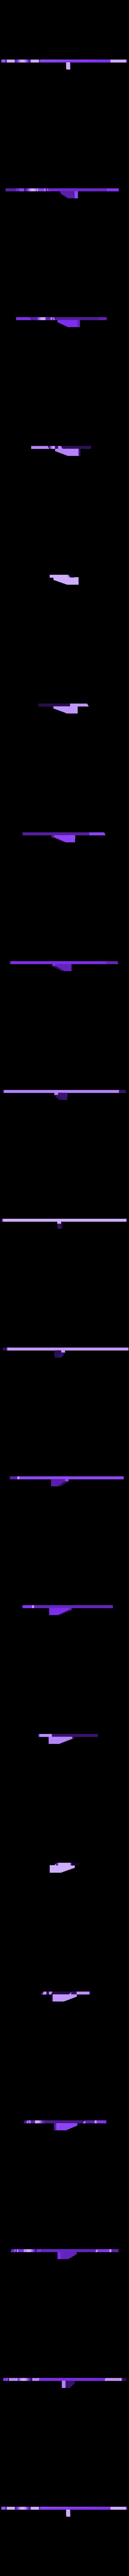 MirrorRun_Board_Front-A.STL Download free STL file 4-8-8-4 Big Boy Locomotive • 3D printer object, RaymondDeLuca